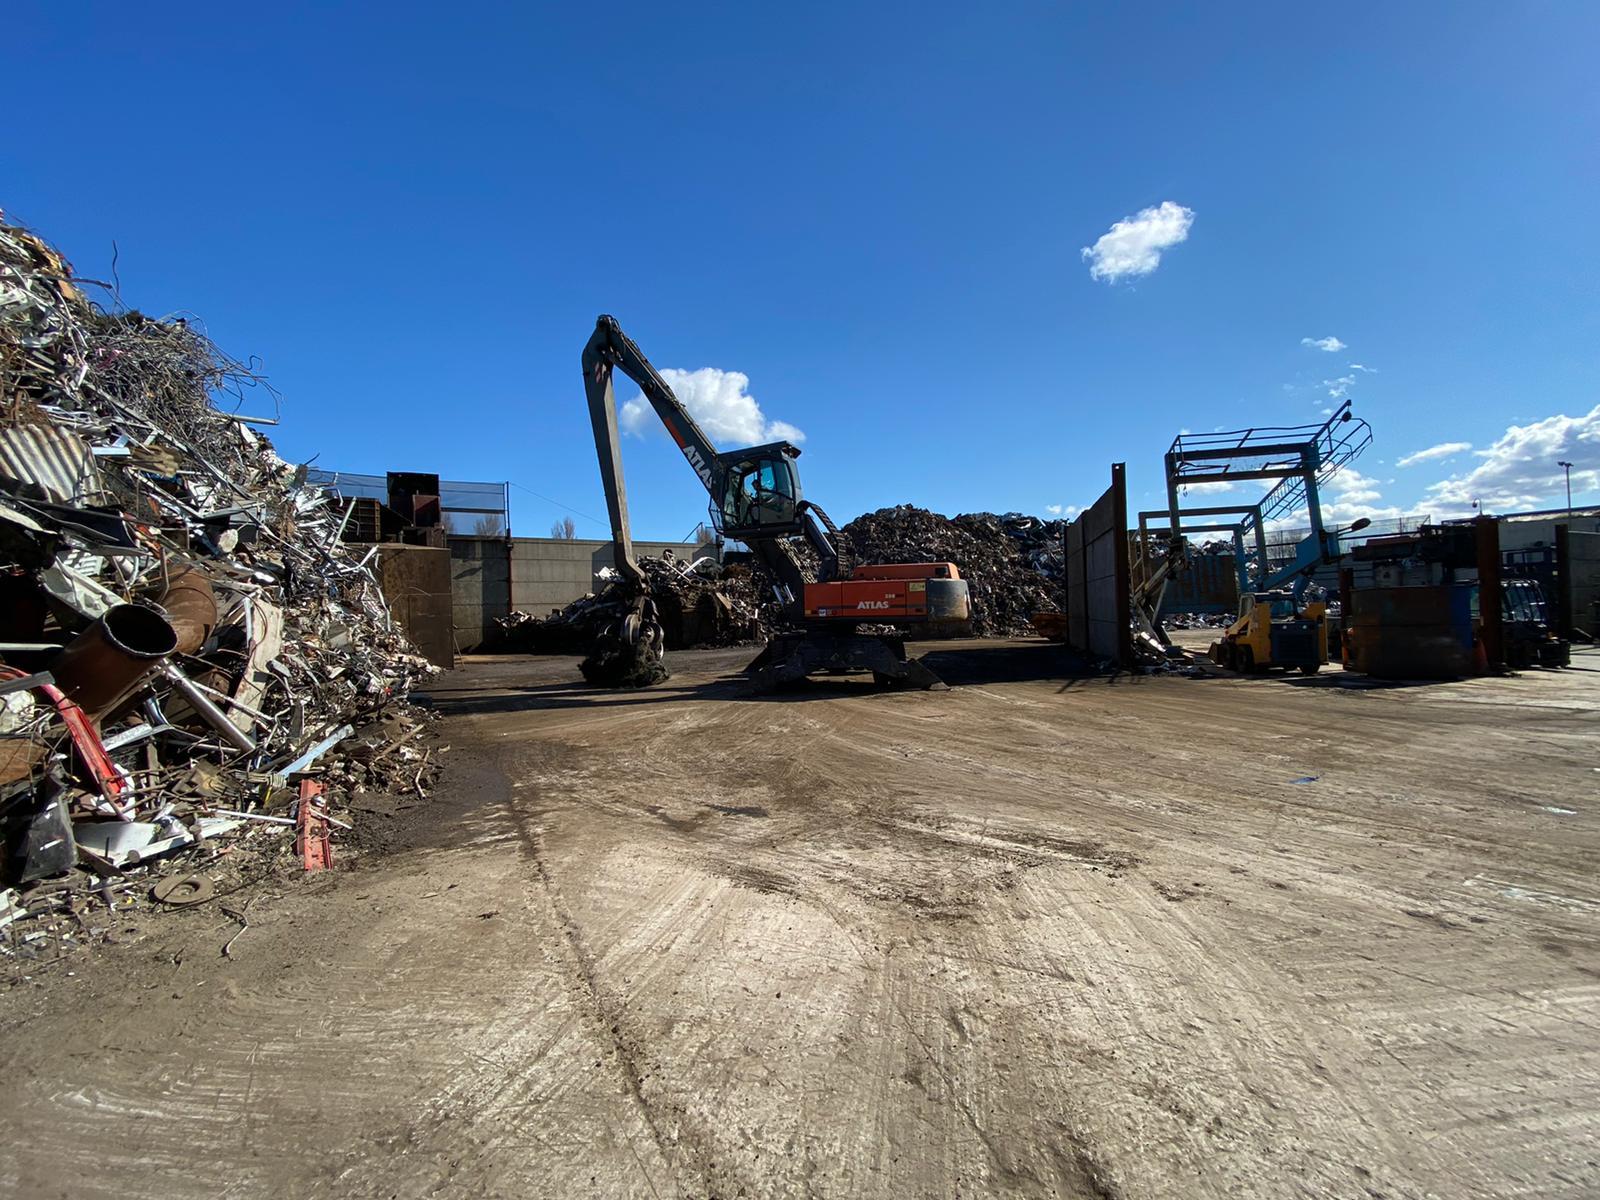 scrap metal recycling site